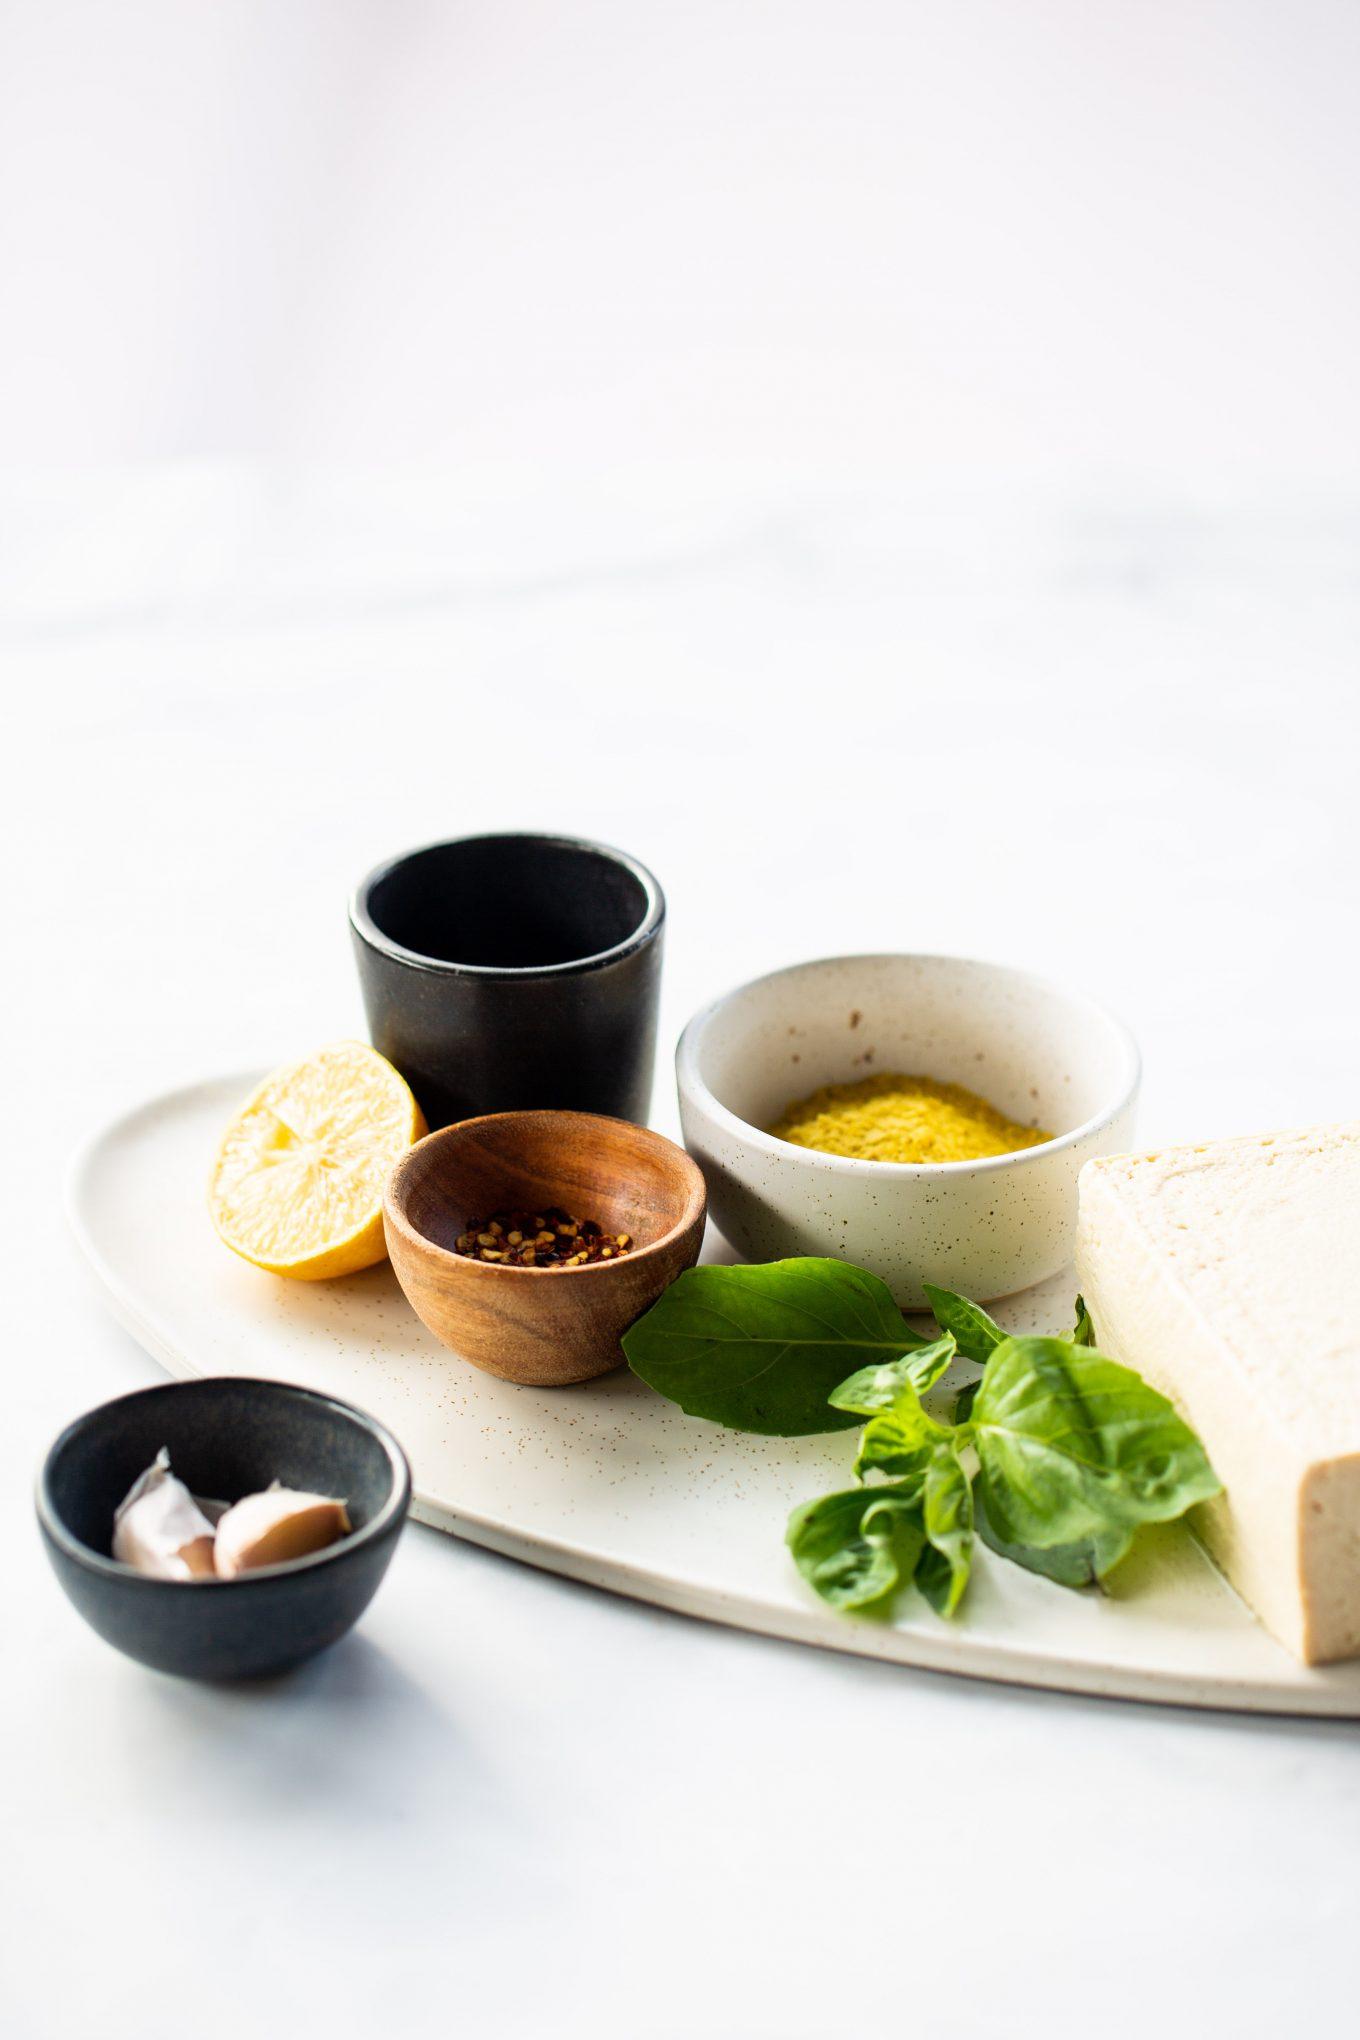 Ingredientes para hacer queso ricotta de tofu